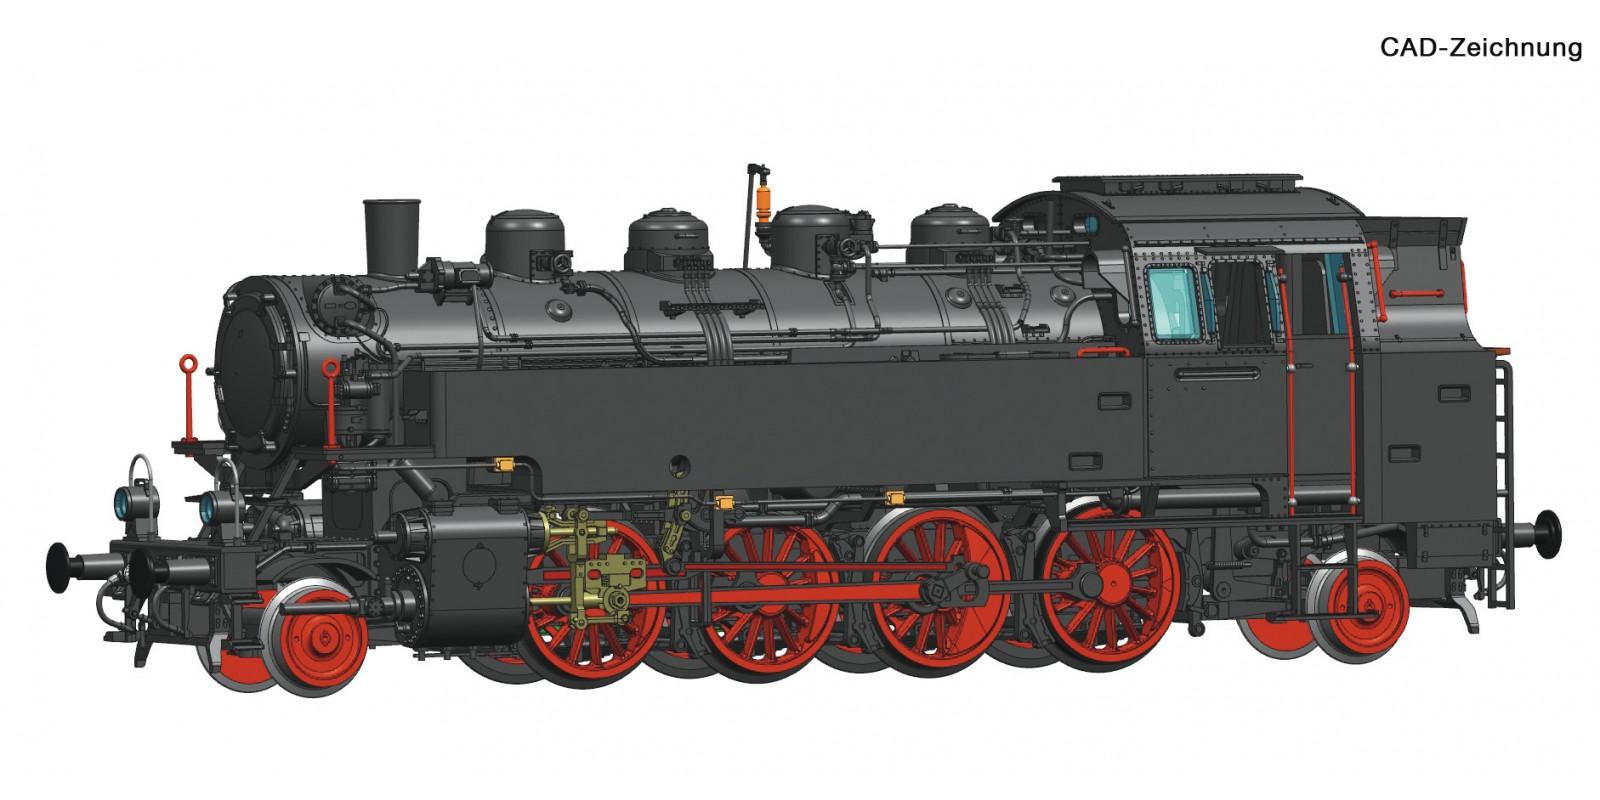 RO73024 Dampflok 86.241 ÖBB